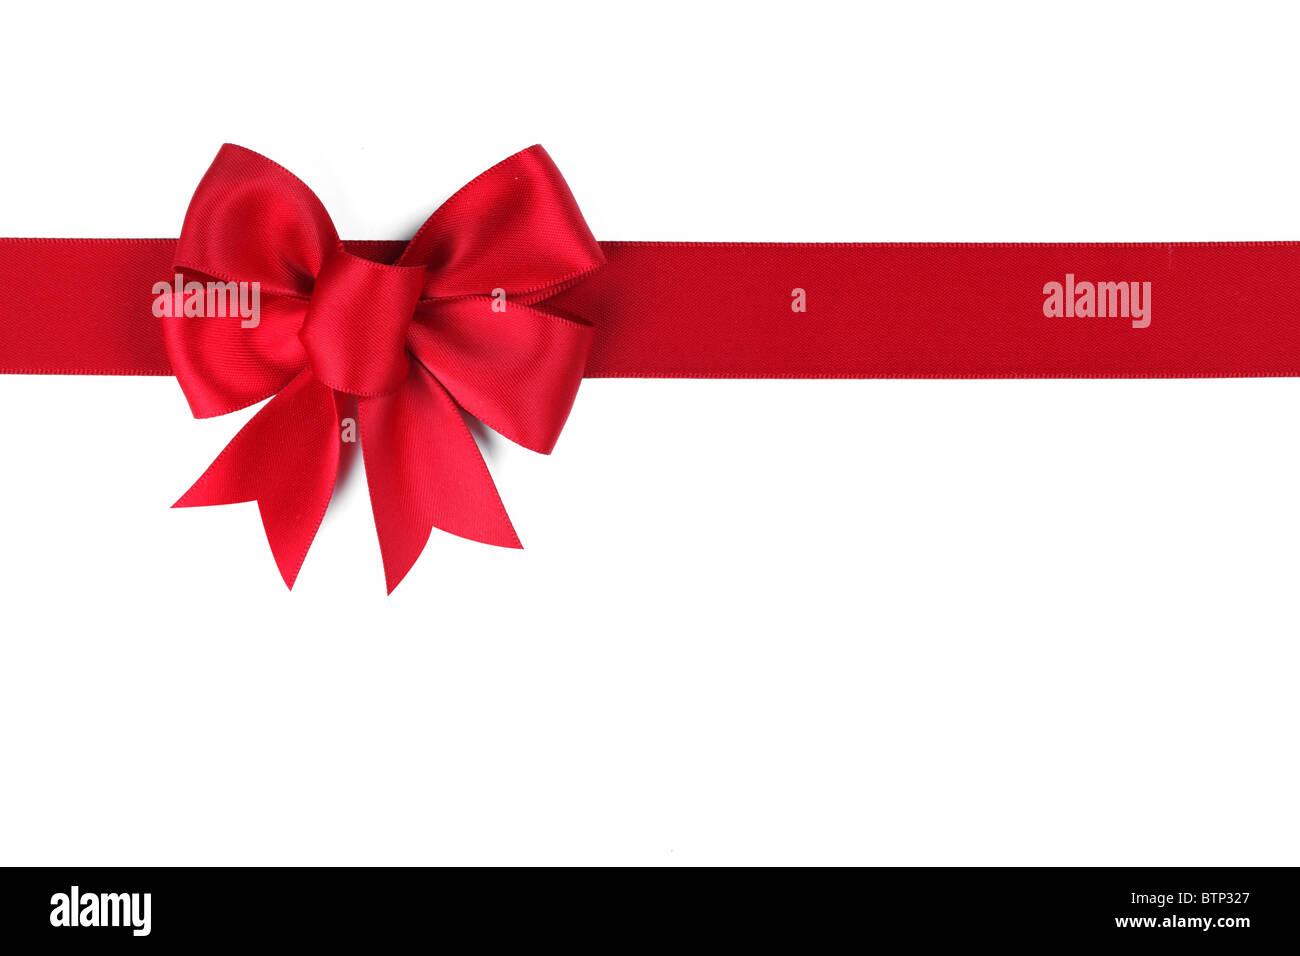 Ruban rouge avec noeud sur white Photo Stock